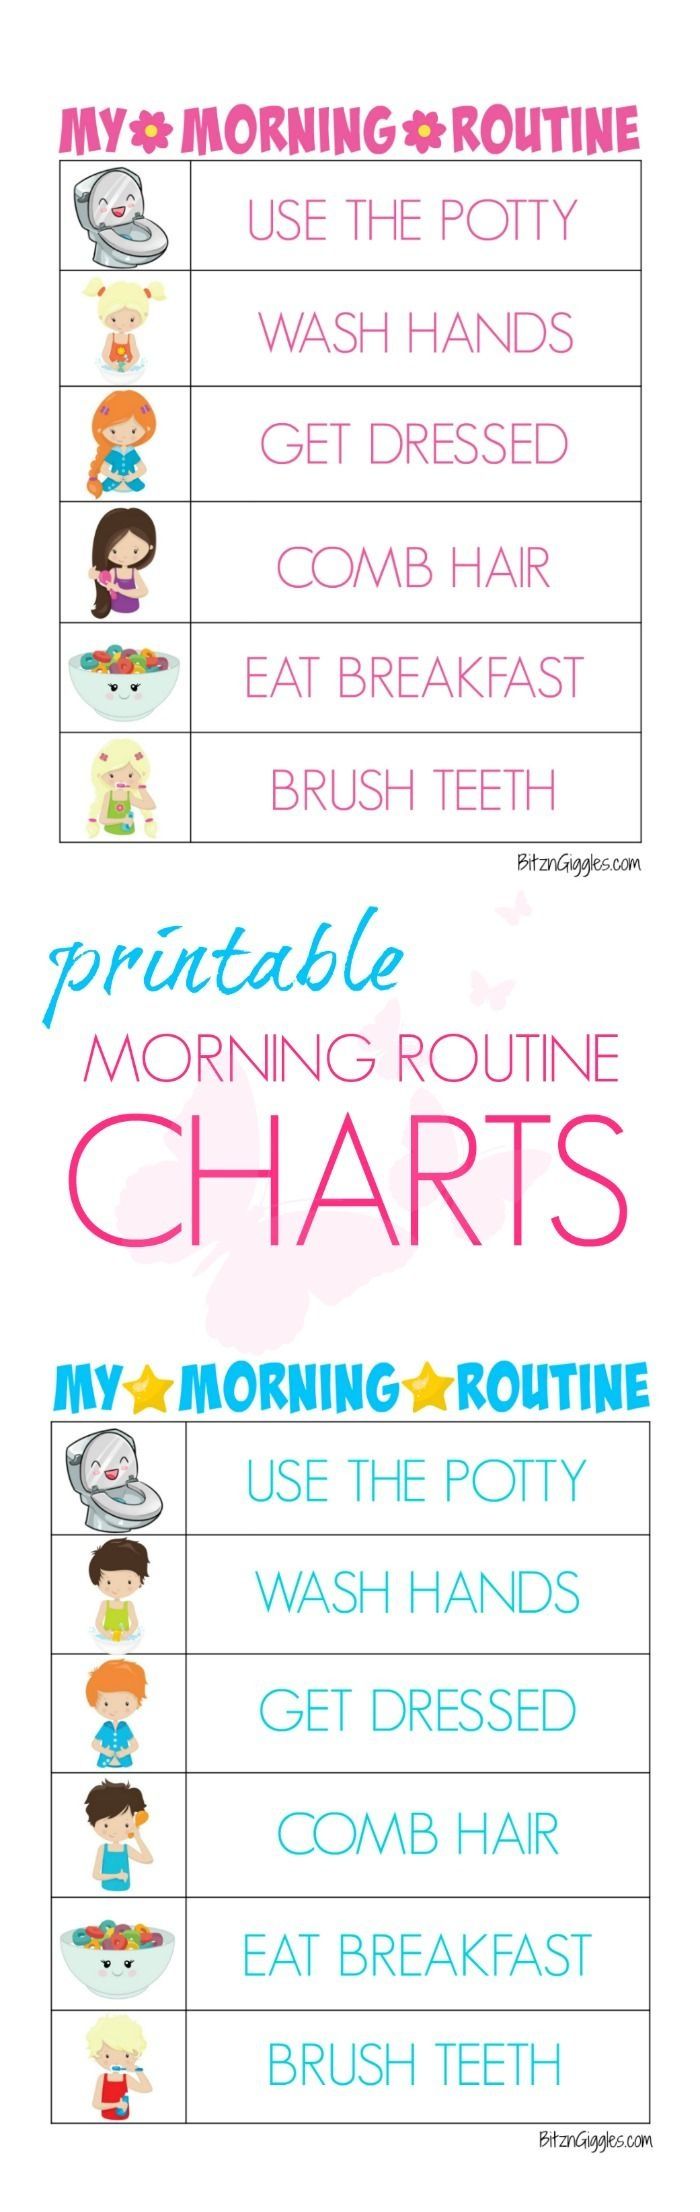 Printable Morning Routine Charts | Bloggers' Fun Family Projects - Free Printable Morning Routine Chart